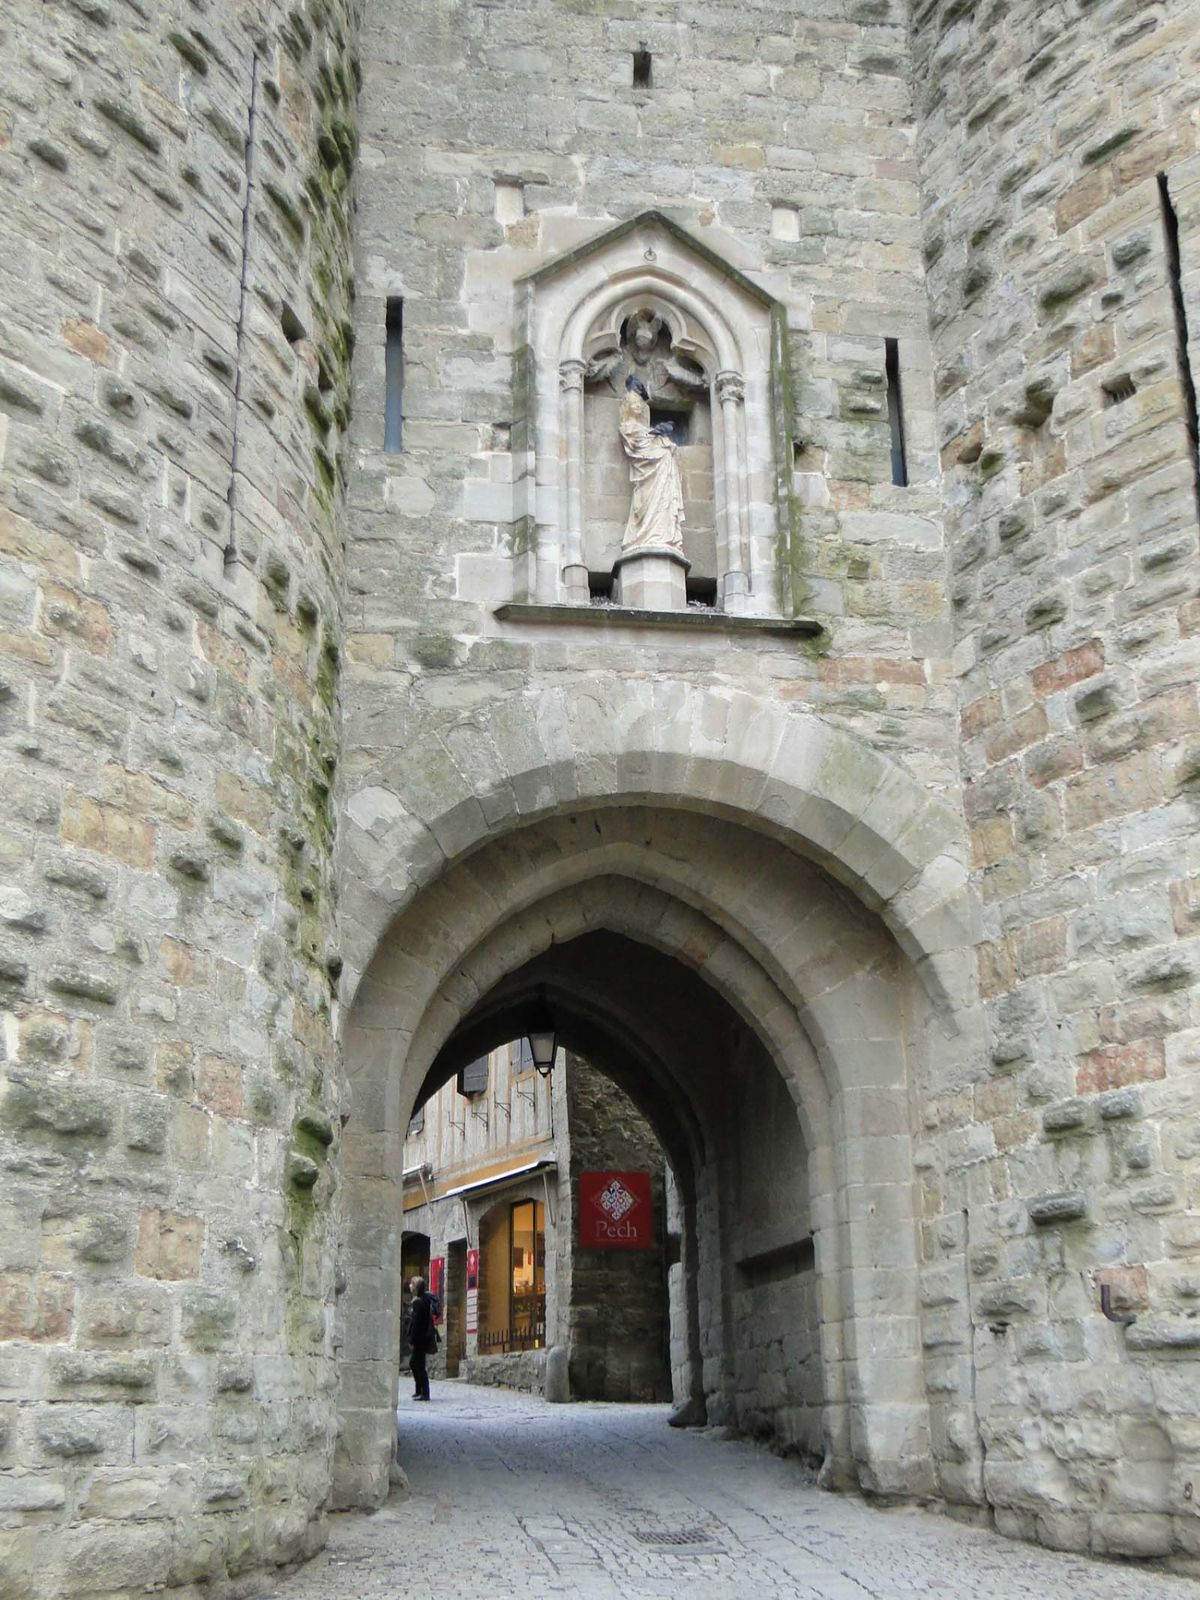 2013 11 06 - Carcassonne